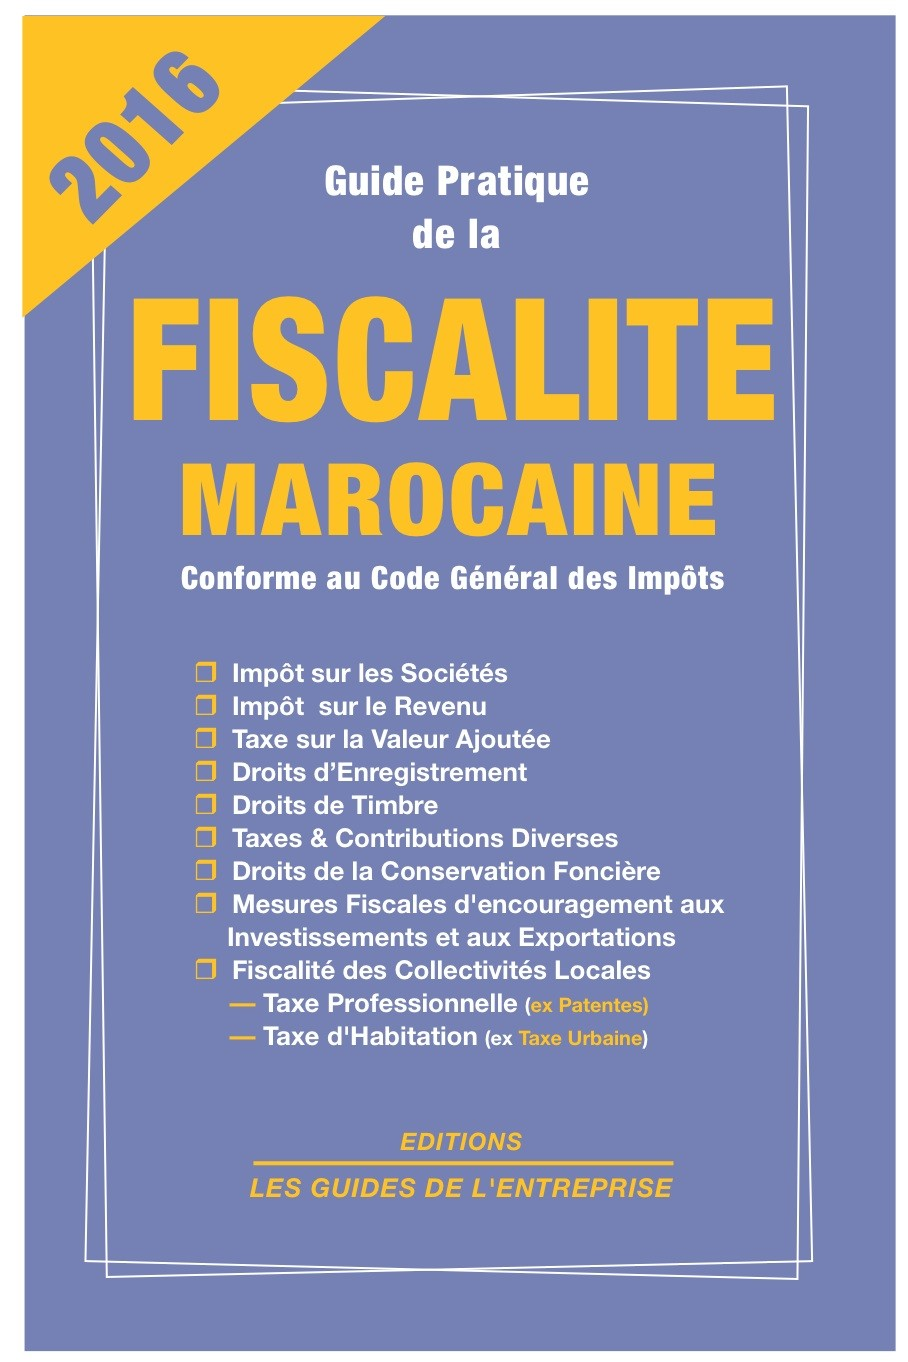 GUIDE PRATIQUE DE LA FISCALITE MAROCAINE